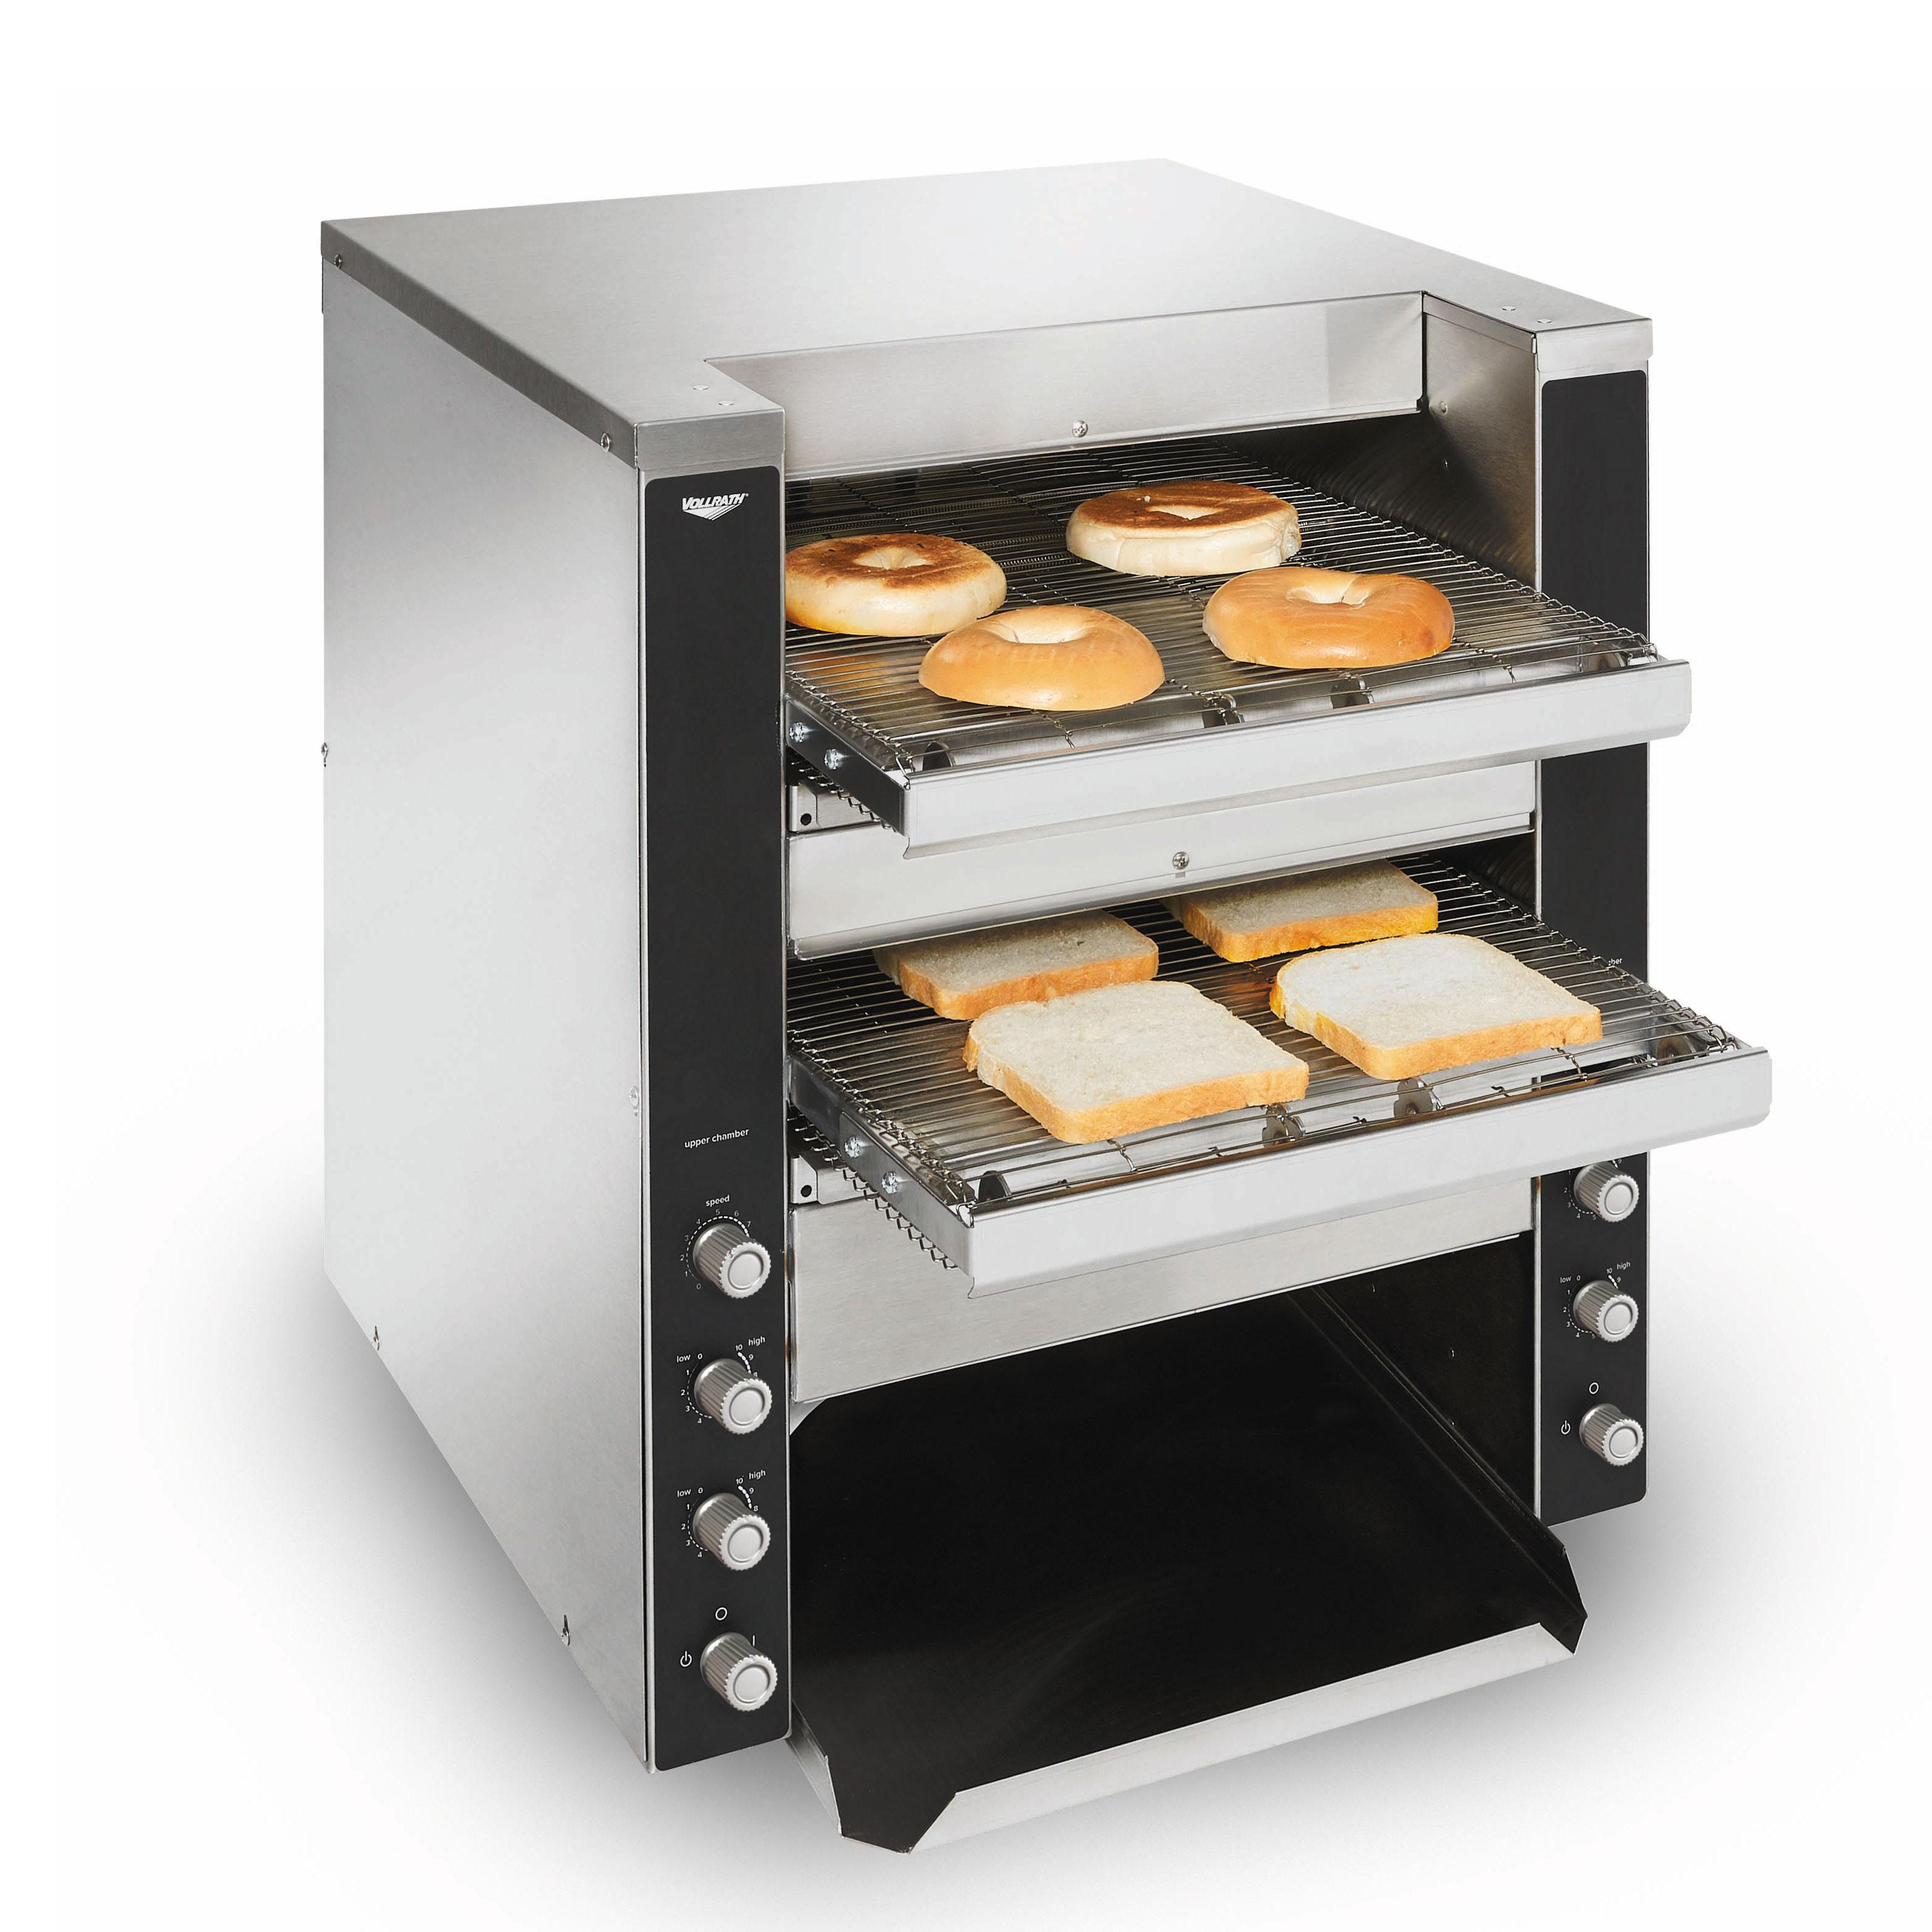 Vollrath CT4-220DUAL toaster, conveyor type